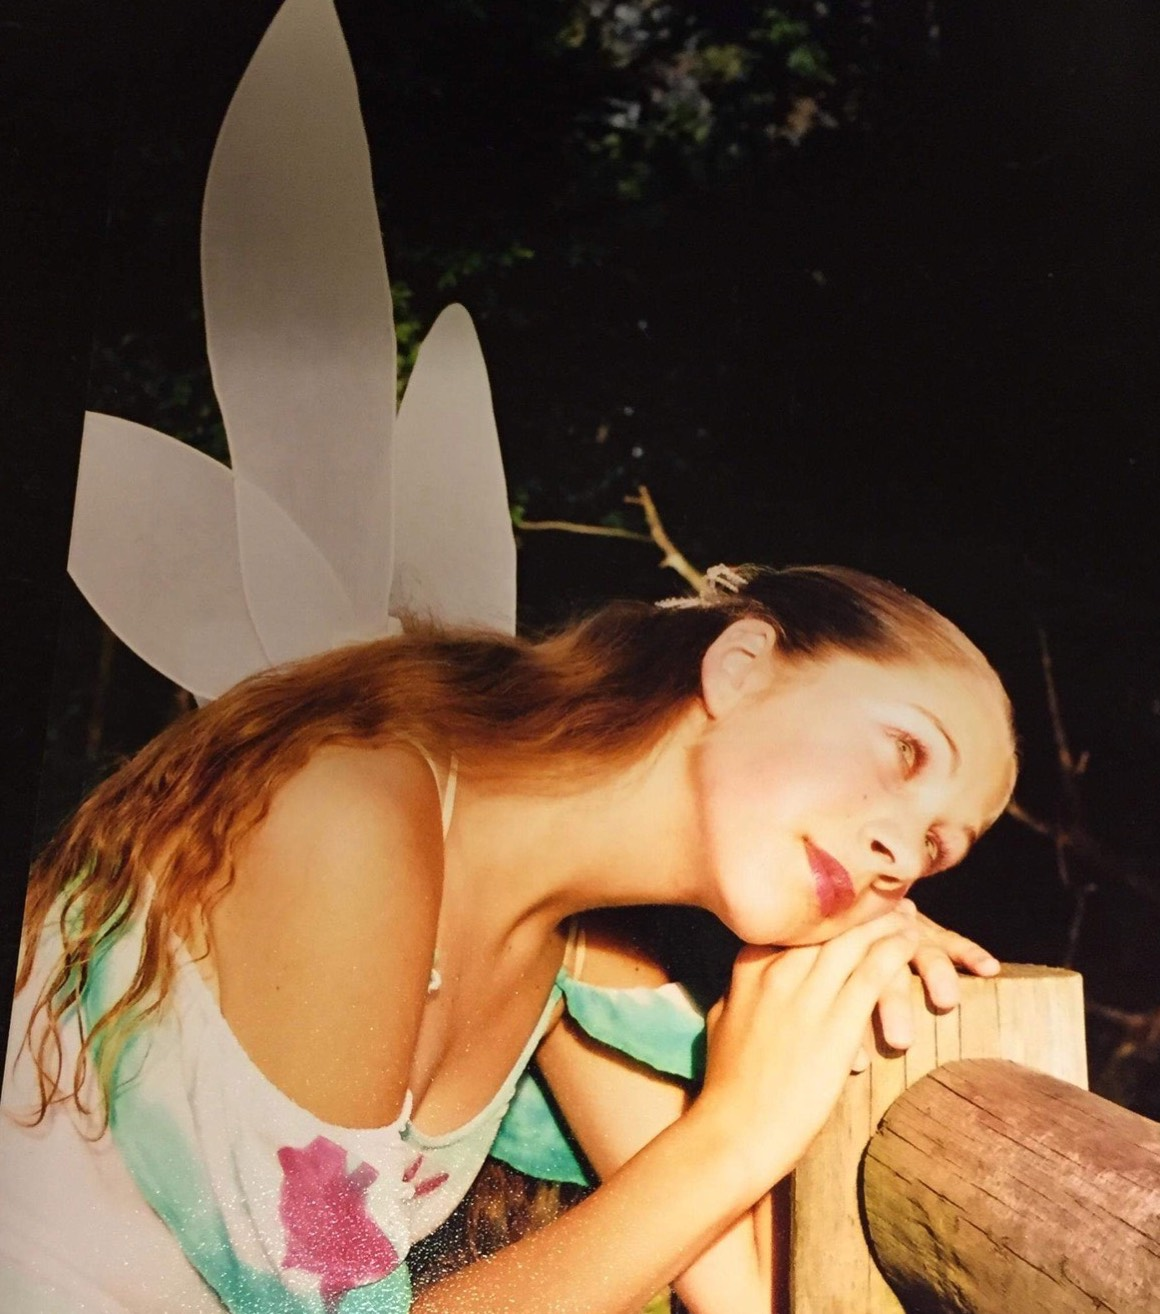 Victoria Rae Sook